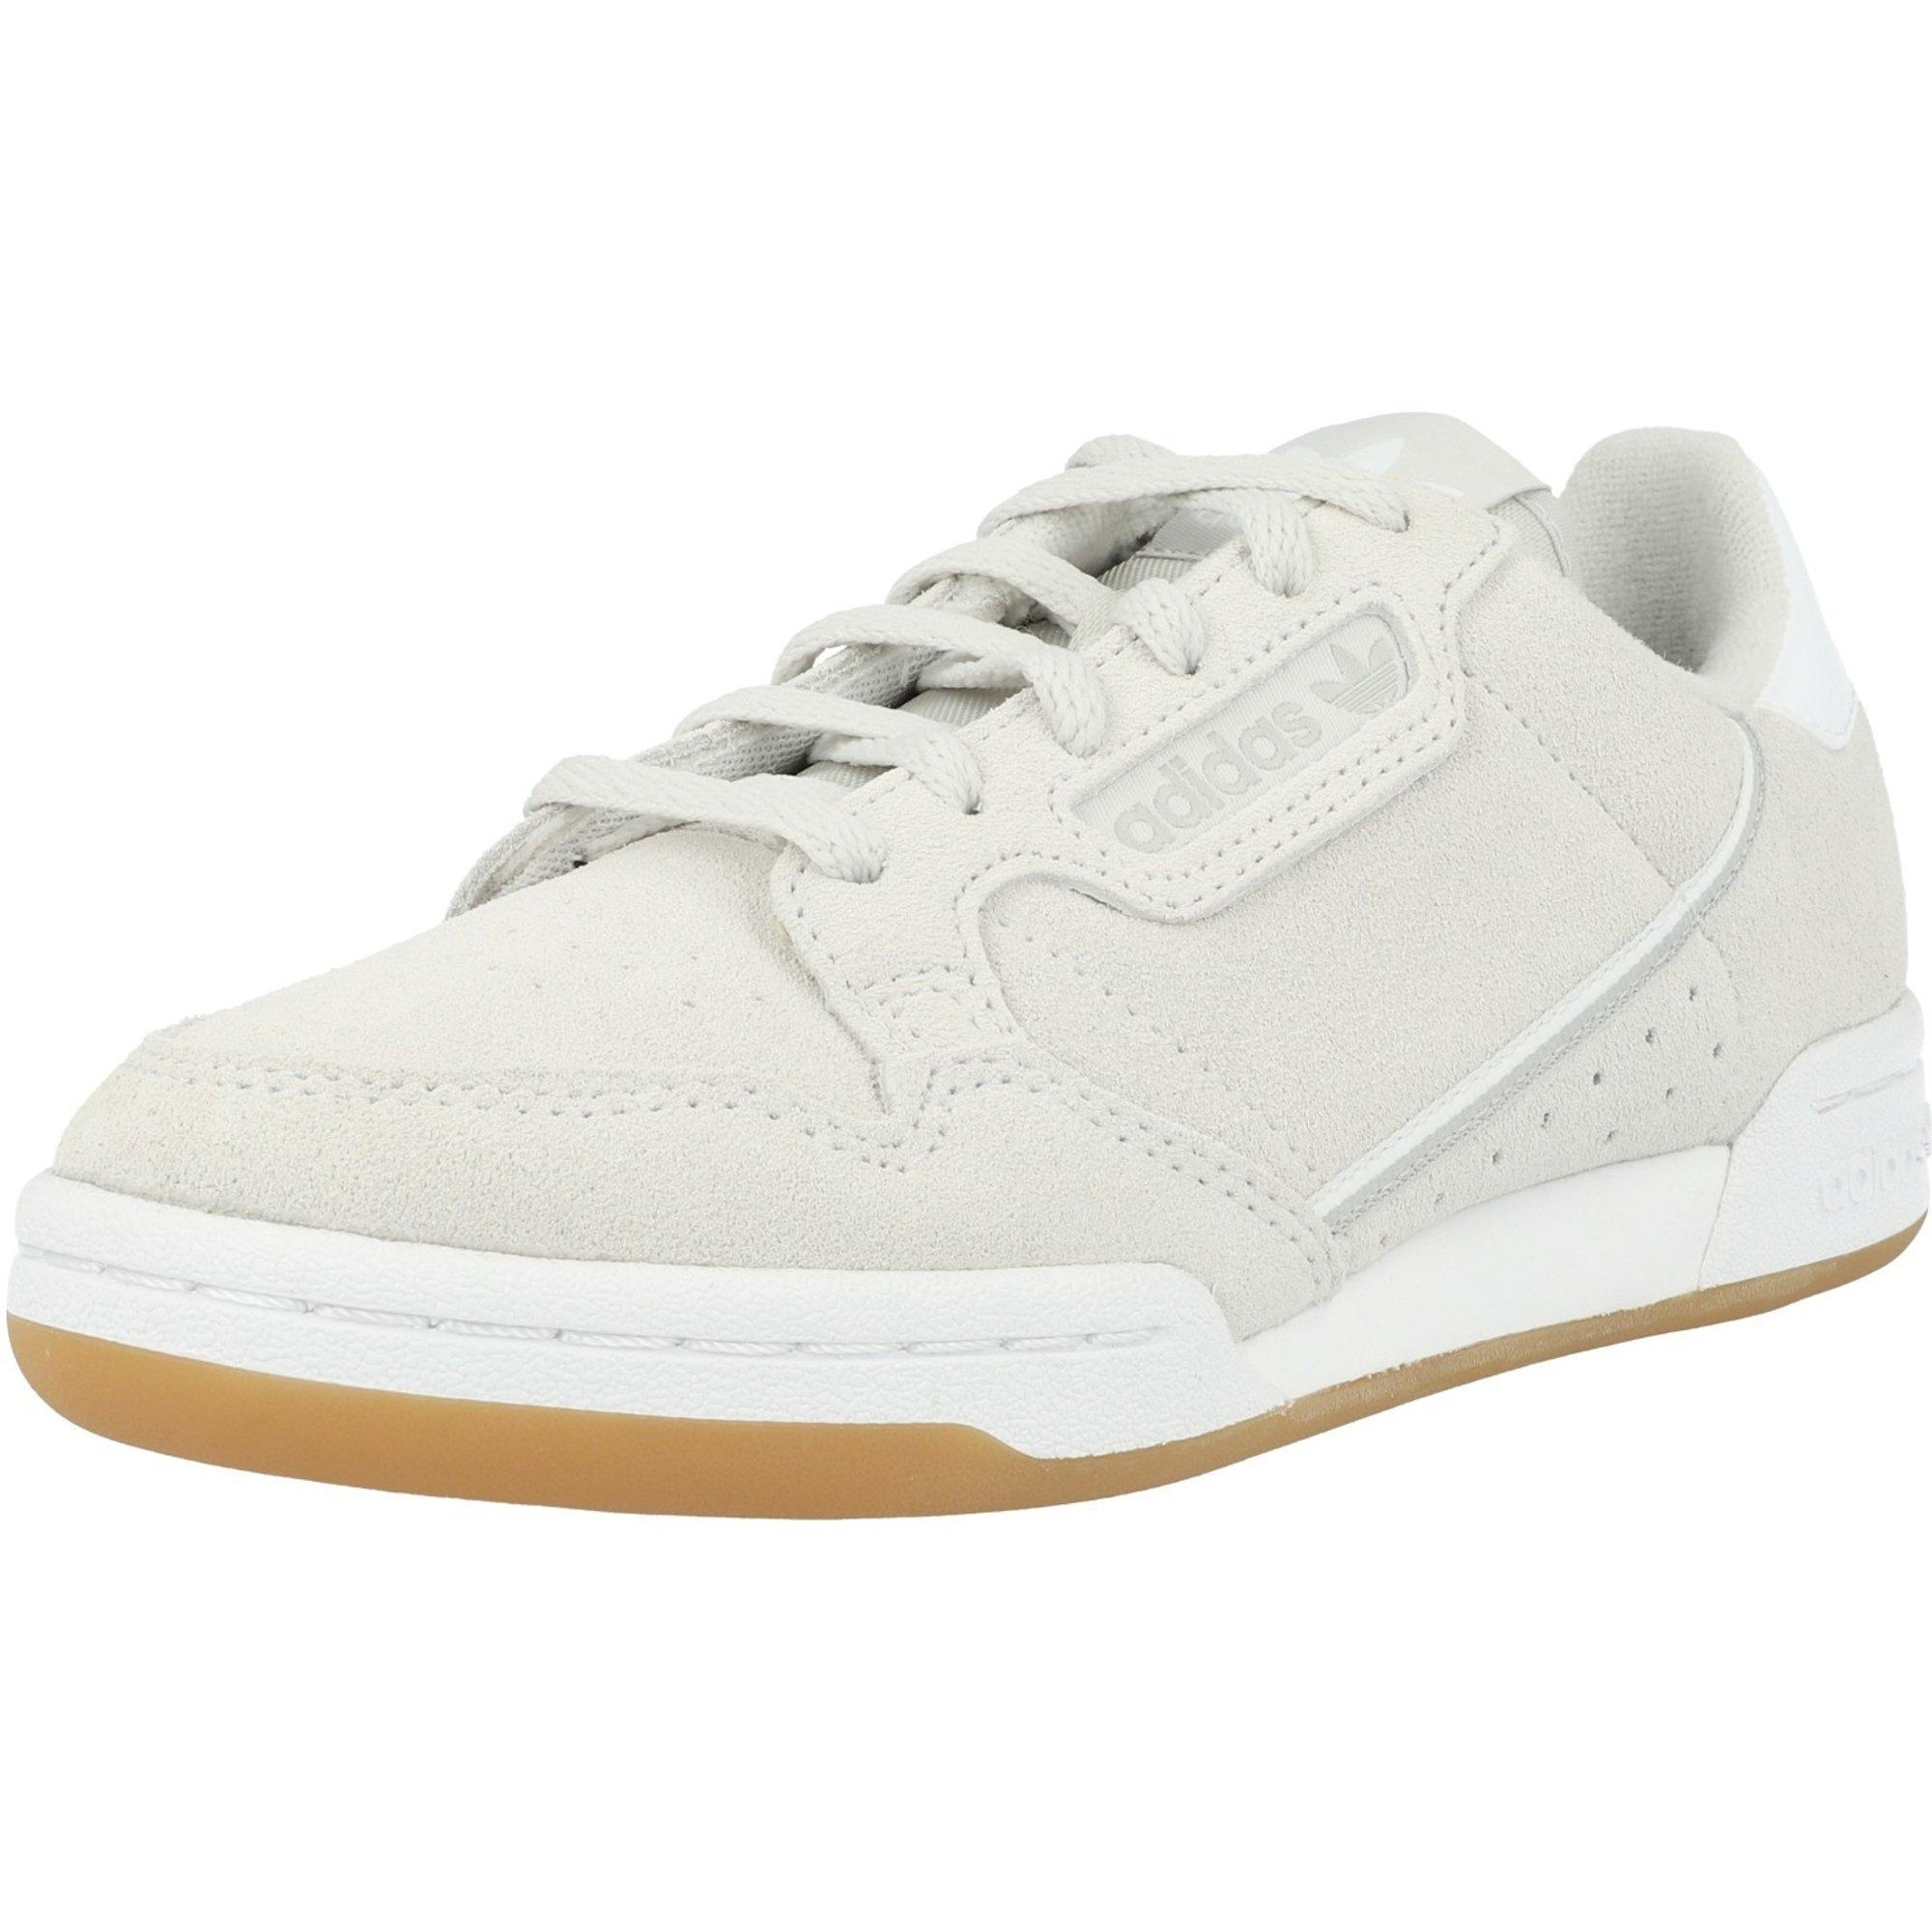 adidas Originals Continental 80 J Grey